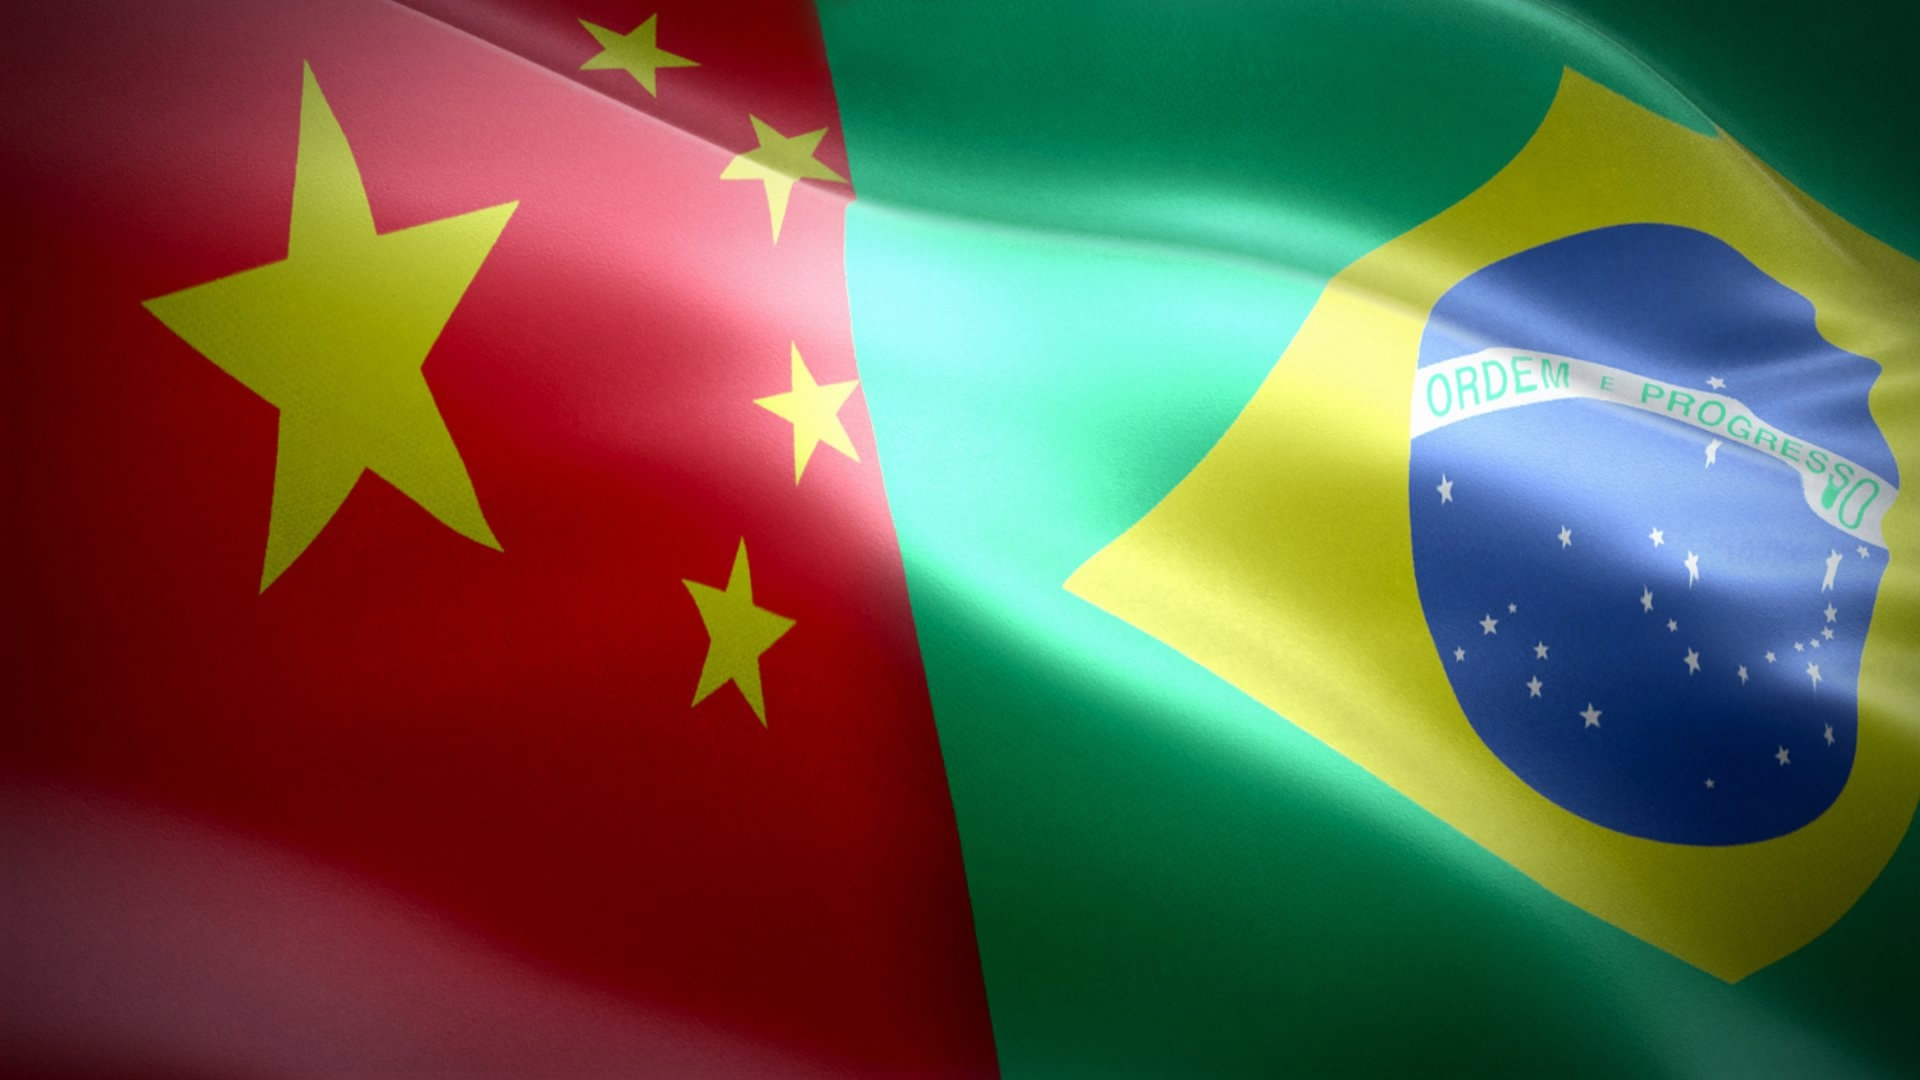 Xi says China ready to help Brazil fight COVID-19